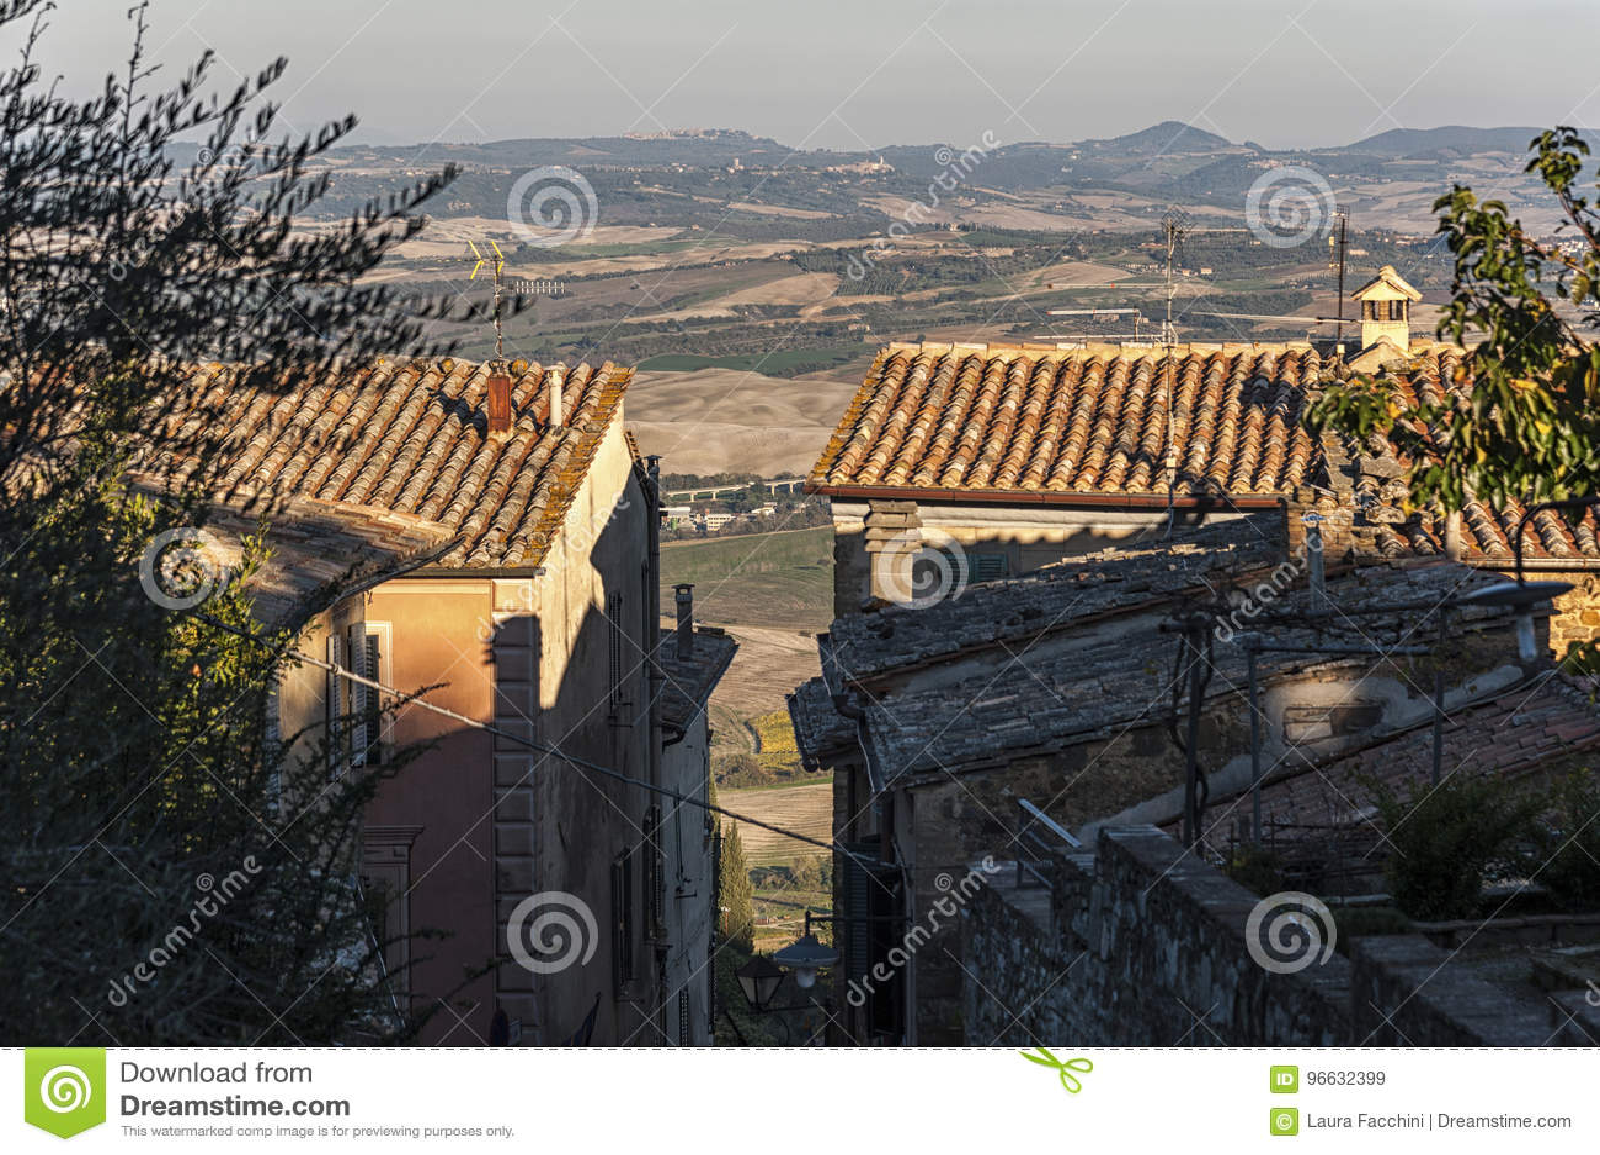 MONTALCINO, TUSCANY/ITALY : LE 31 OCTOBRE 2016 : Rue étroite au centre historique de la ville de Montalcino, ` Orcia, Toscane, It